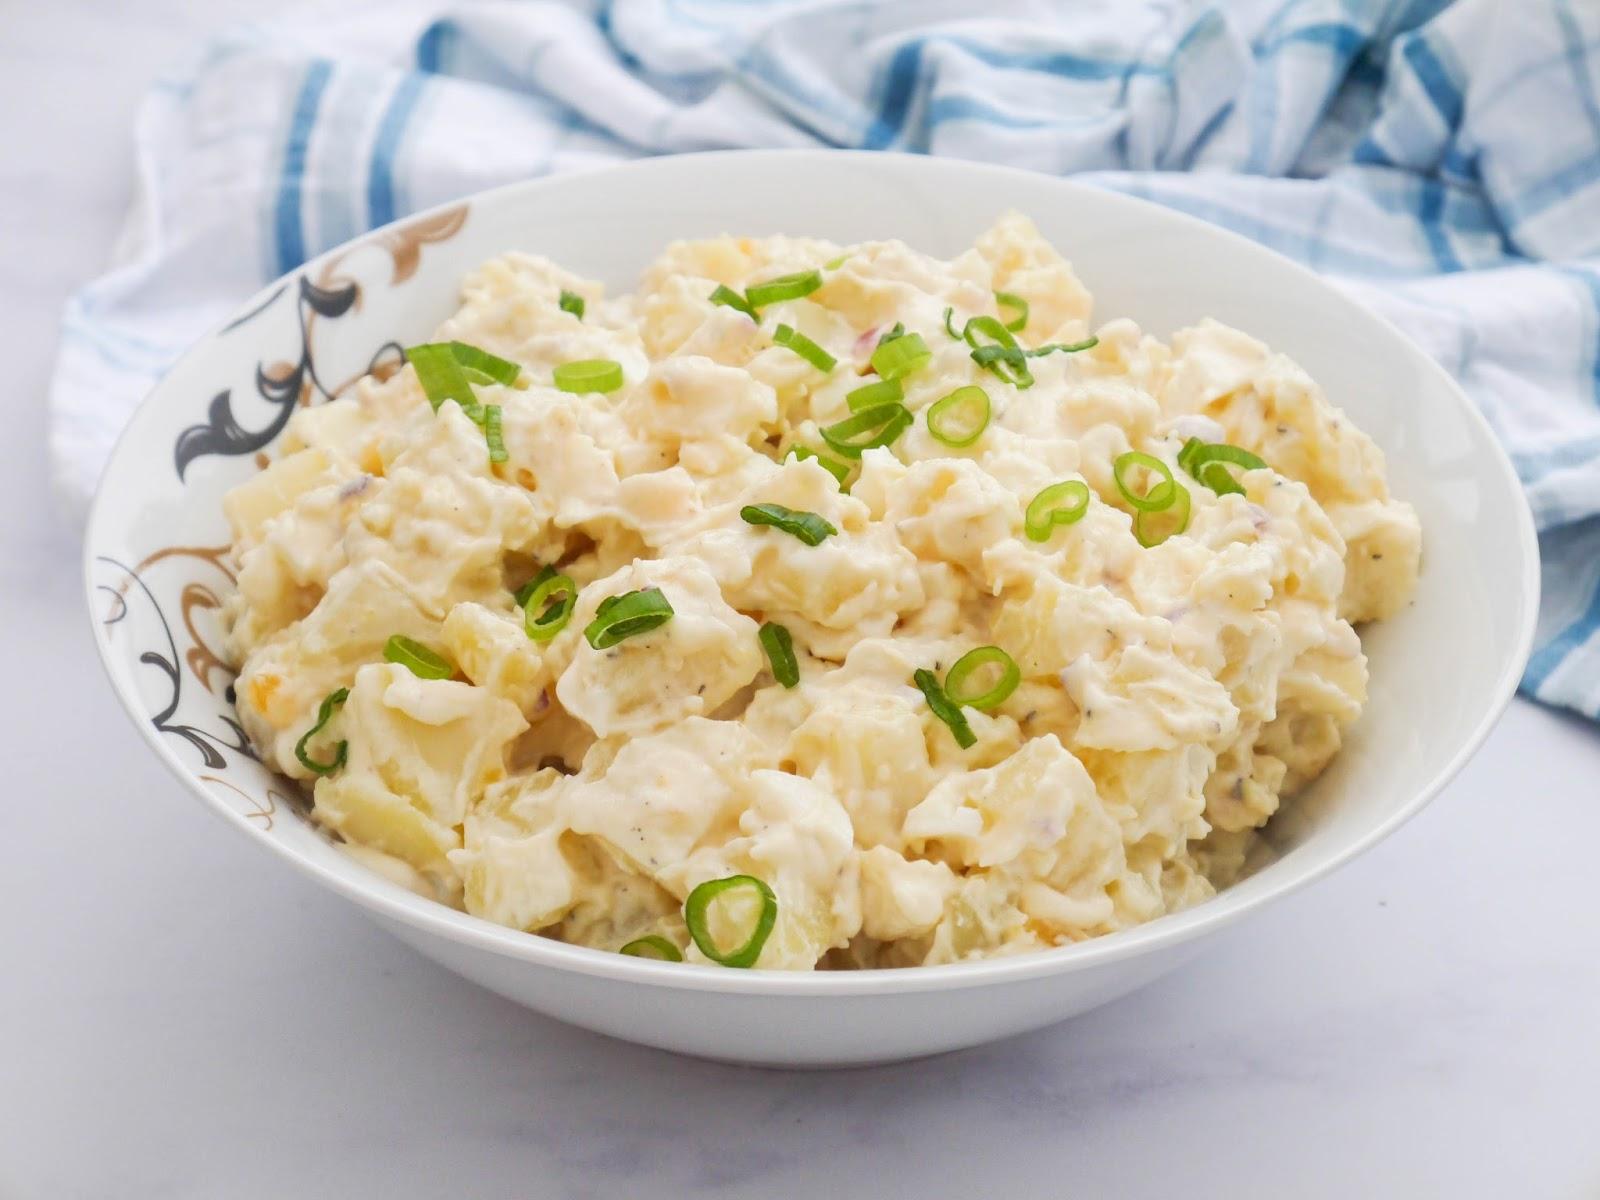 Potato Salad Recipe Not Creamy